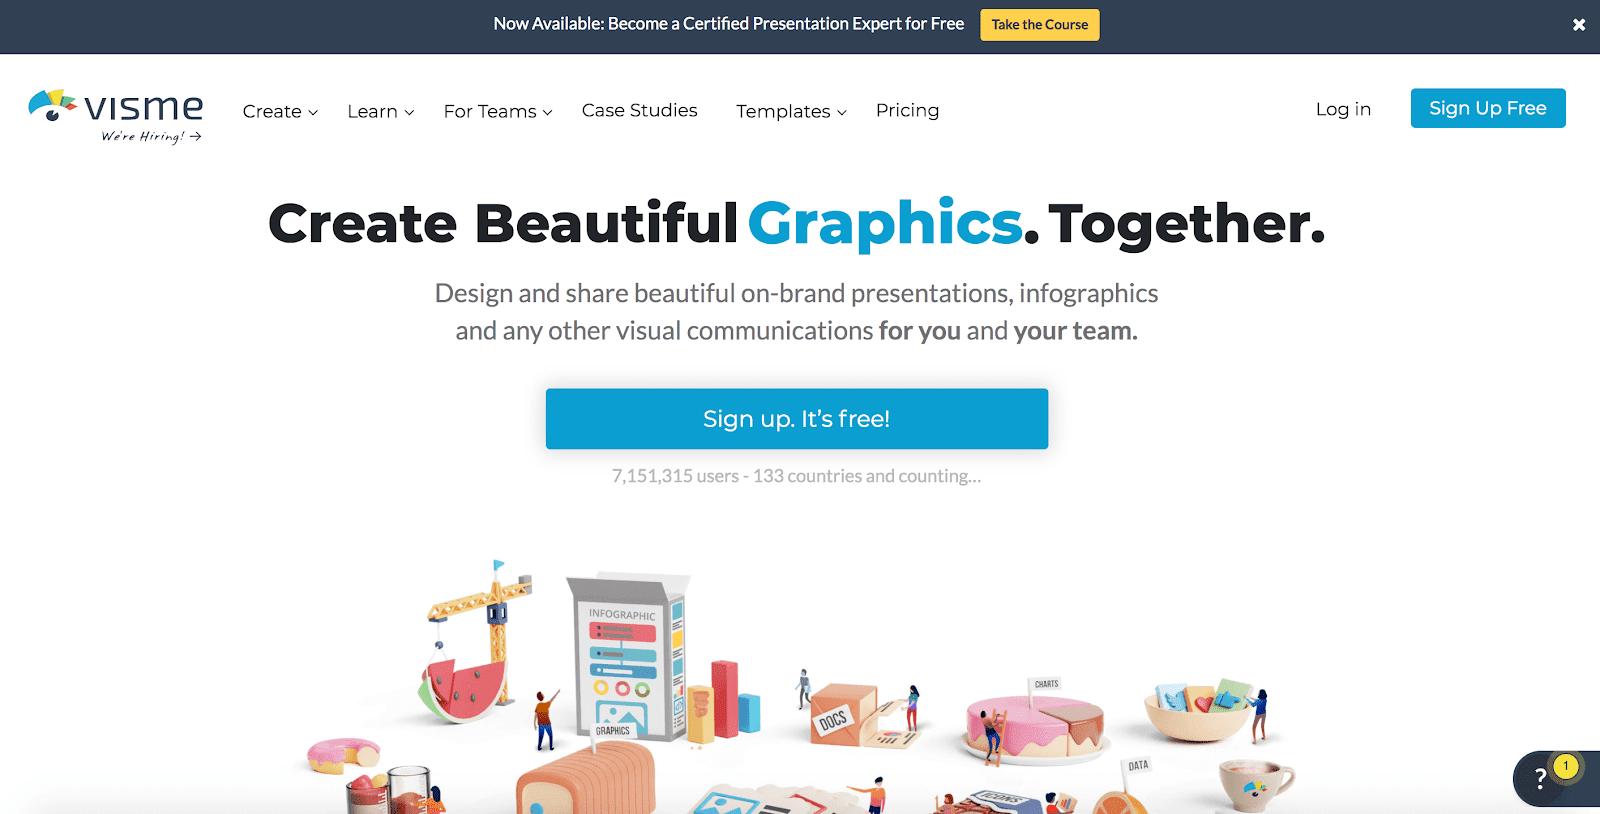 Visme home page